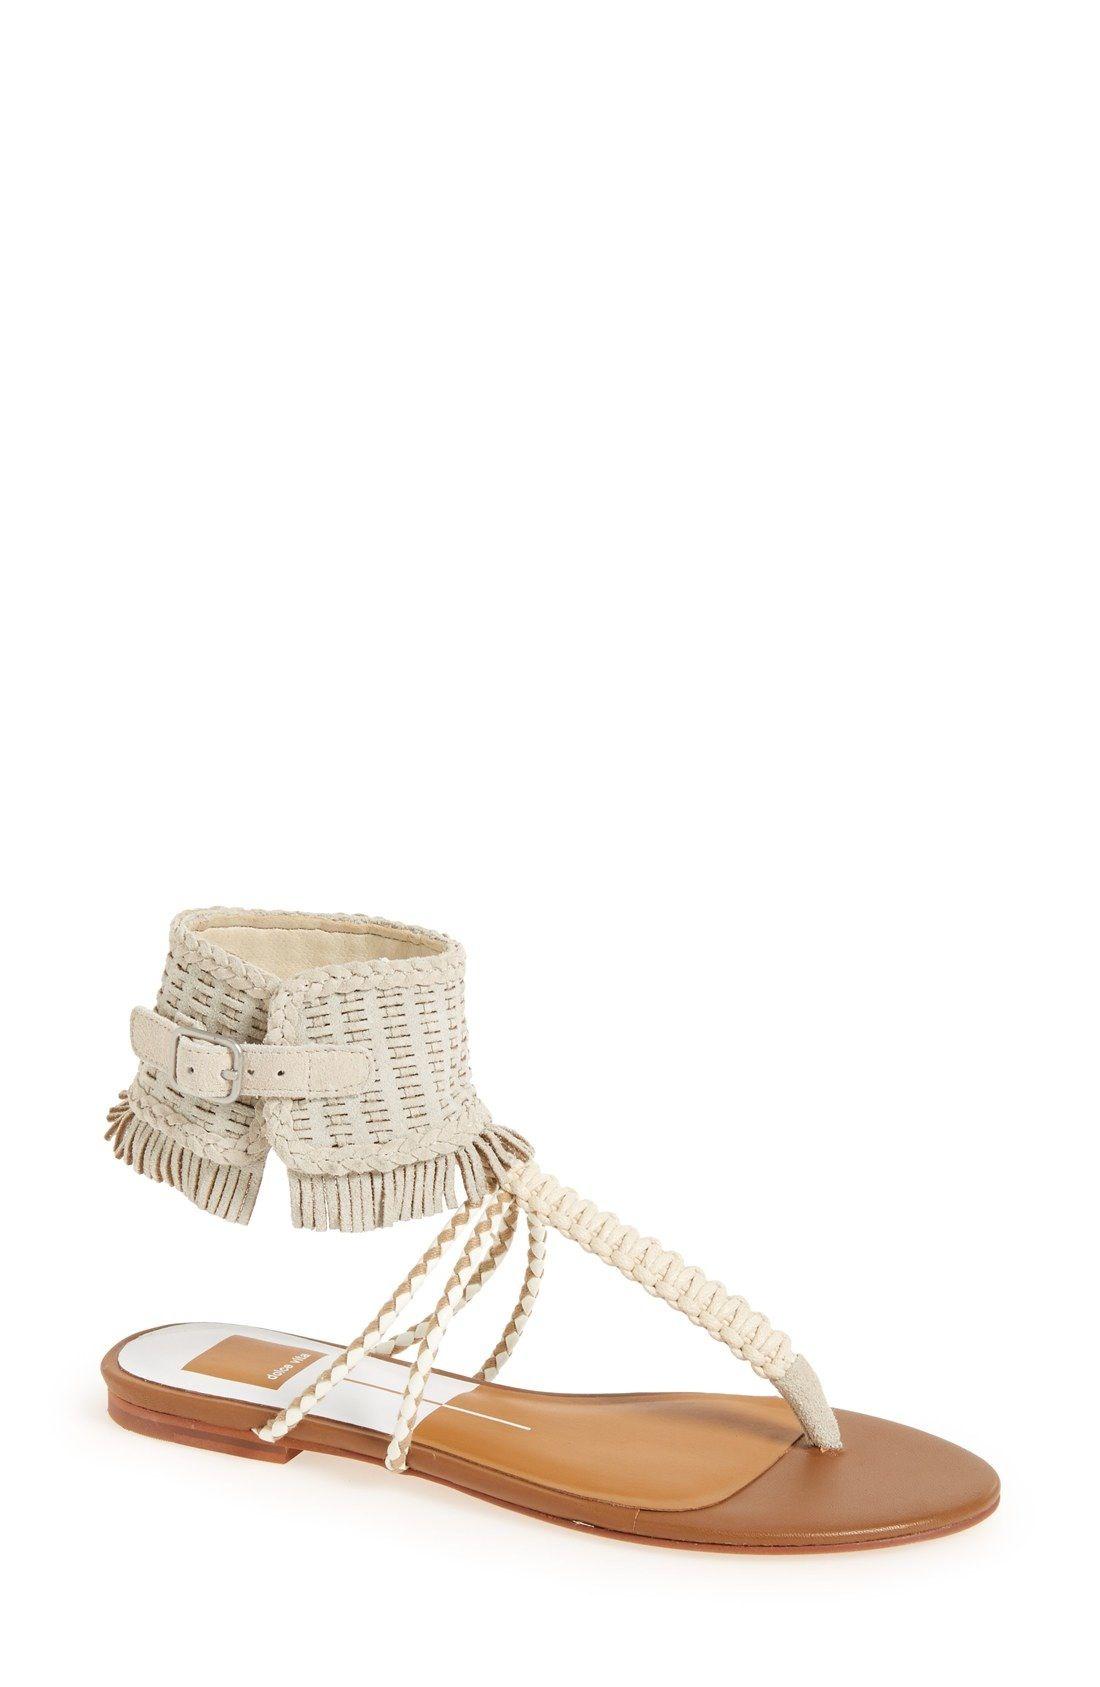 Dolce Vita Fringe flat sandals 88auR